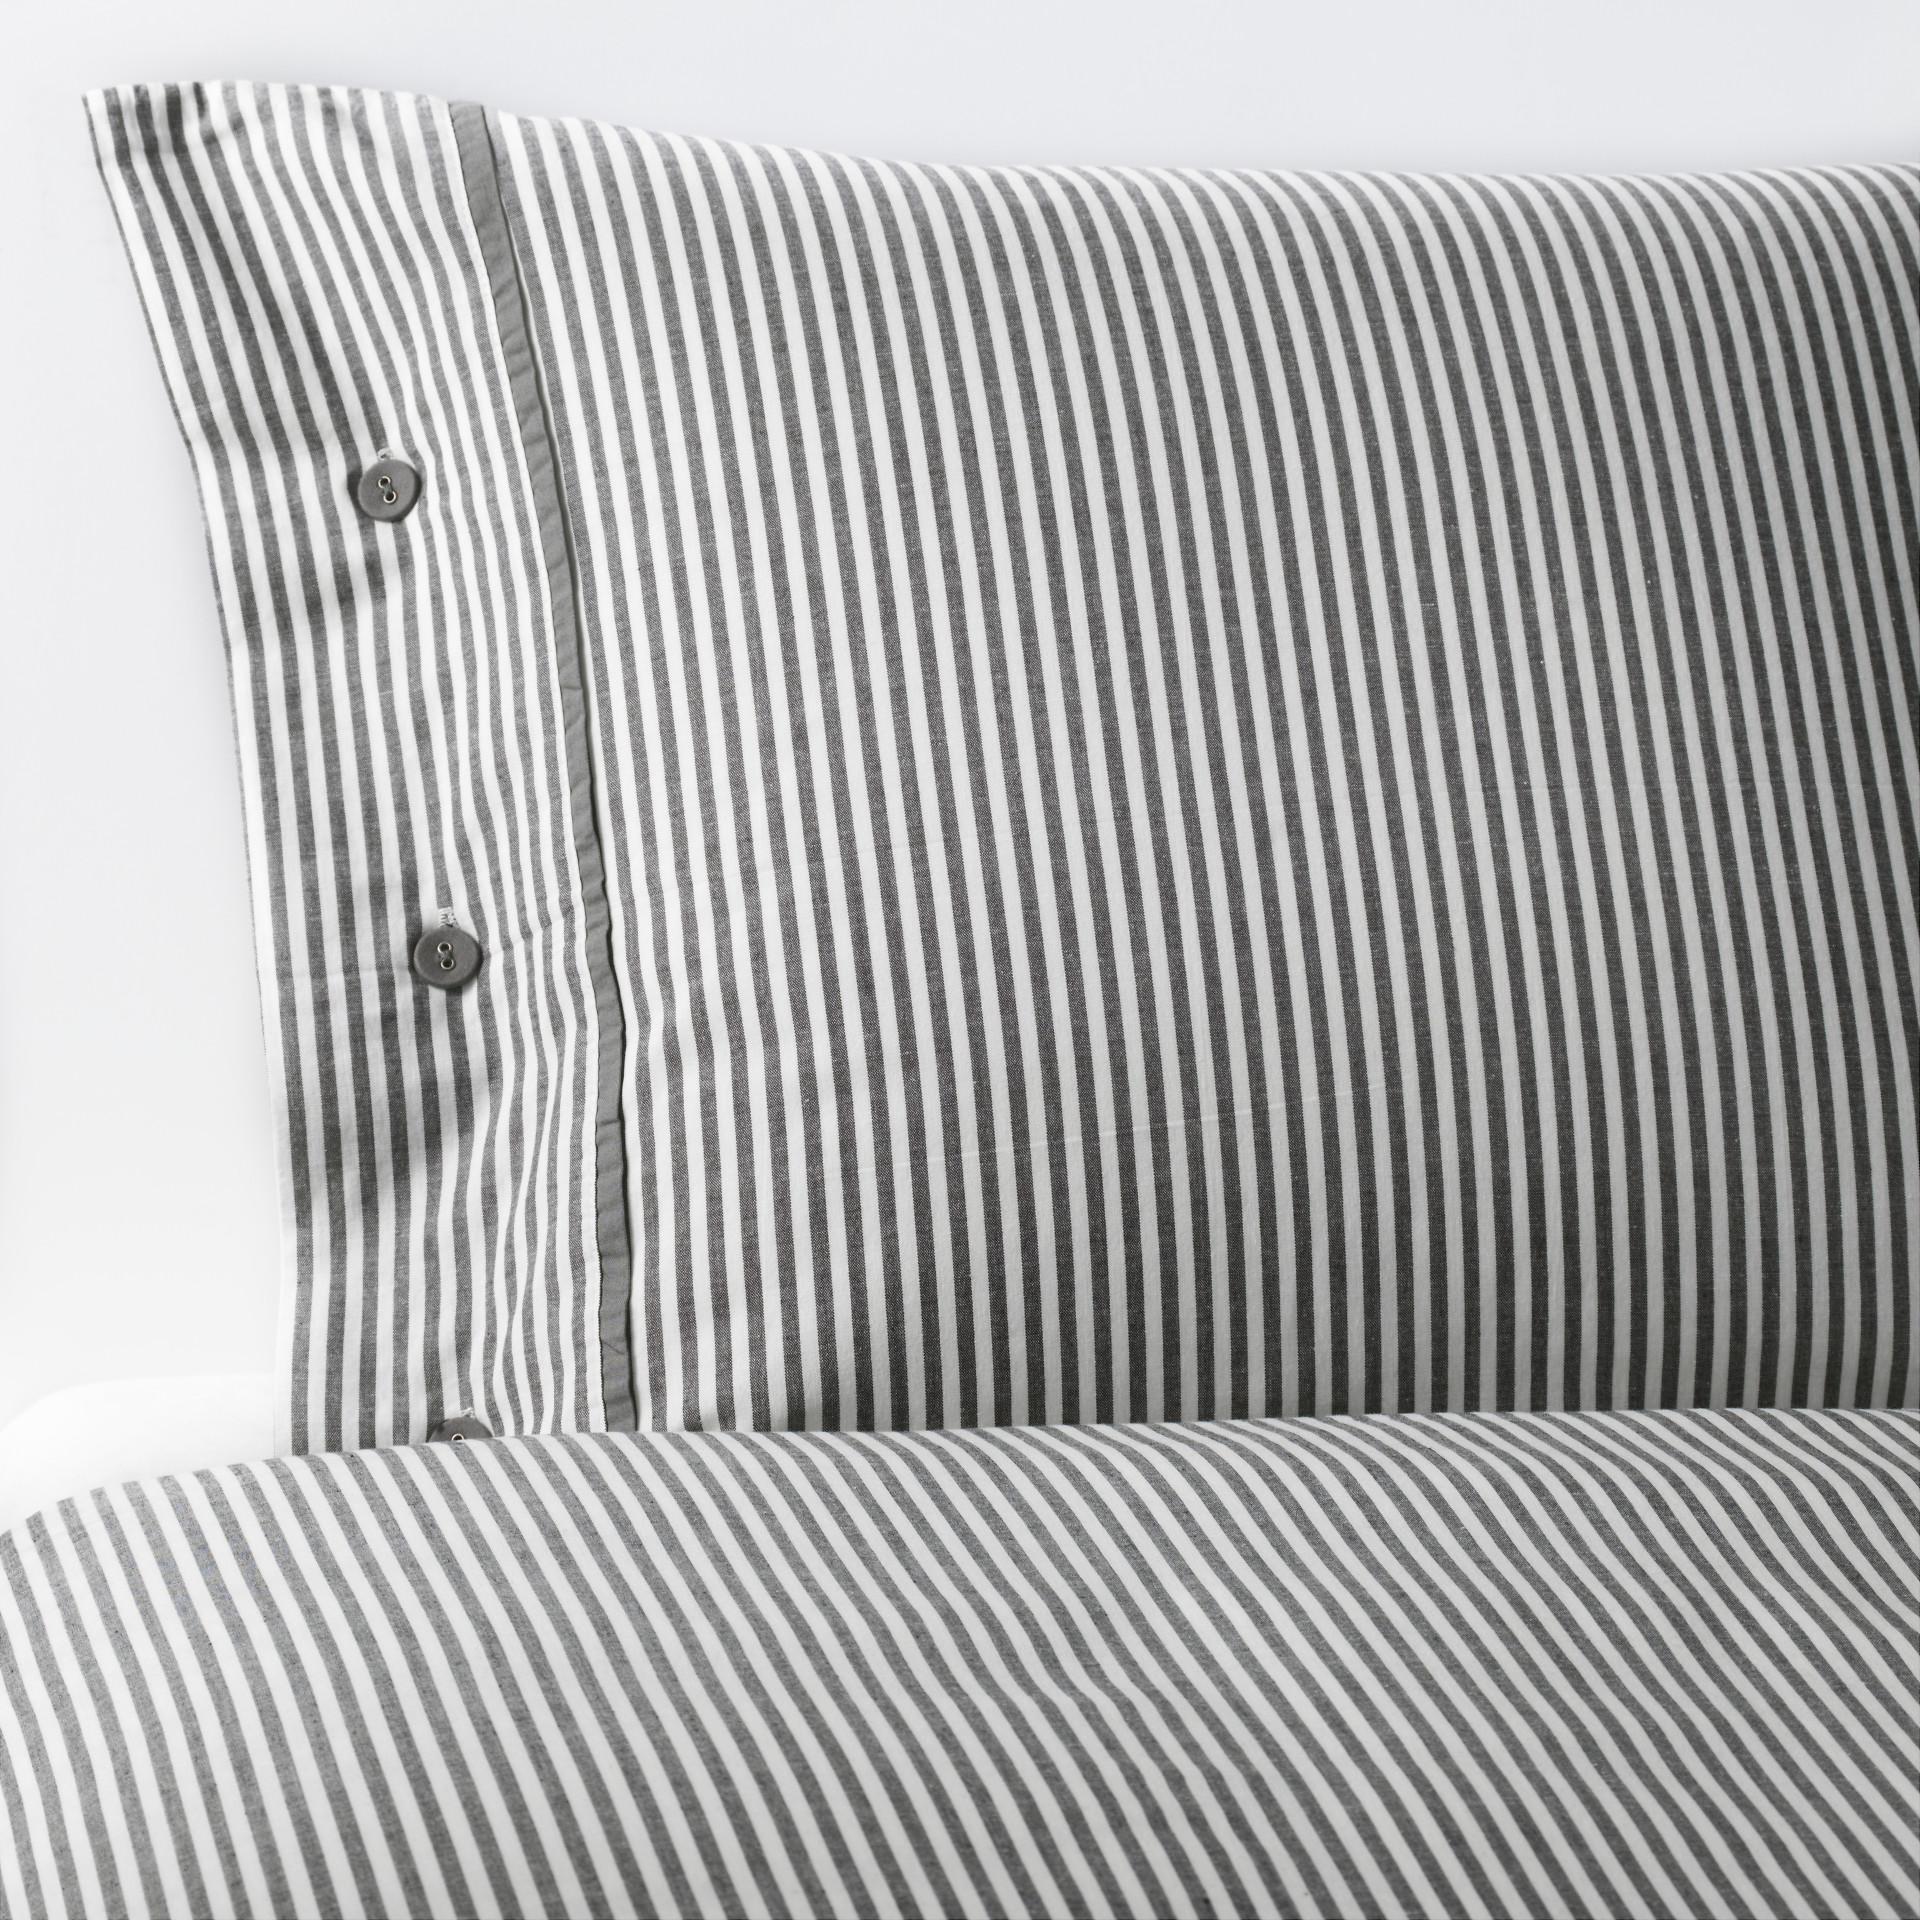 NYPONROS Duvet cover and pillowcase(s) - Full/Queen (Double/Queen) - IKEA